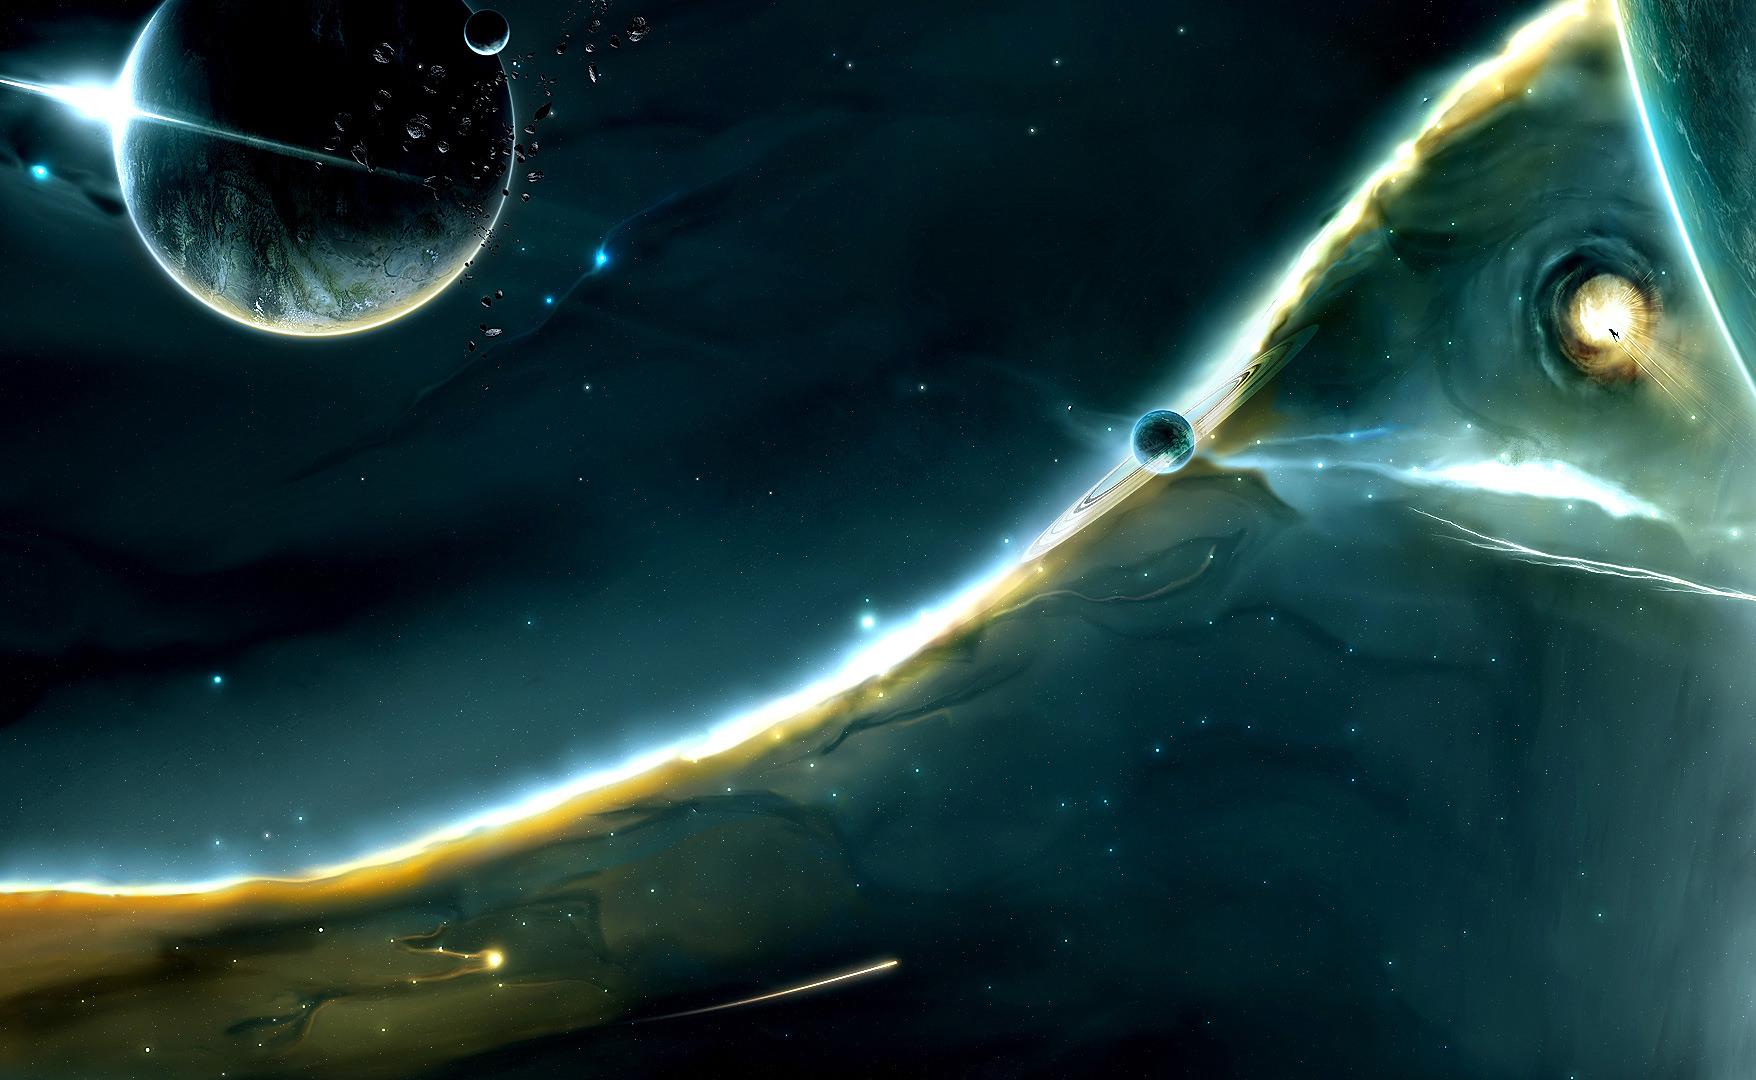 1080p Digital Universe HD Wallpaper